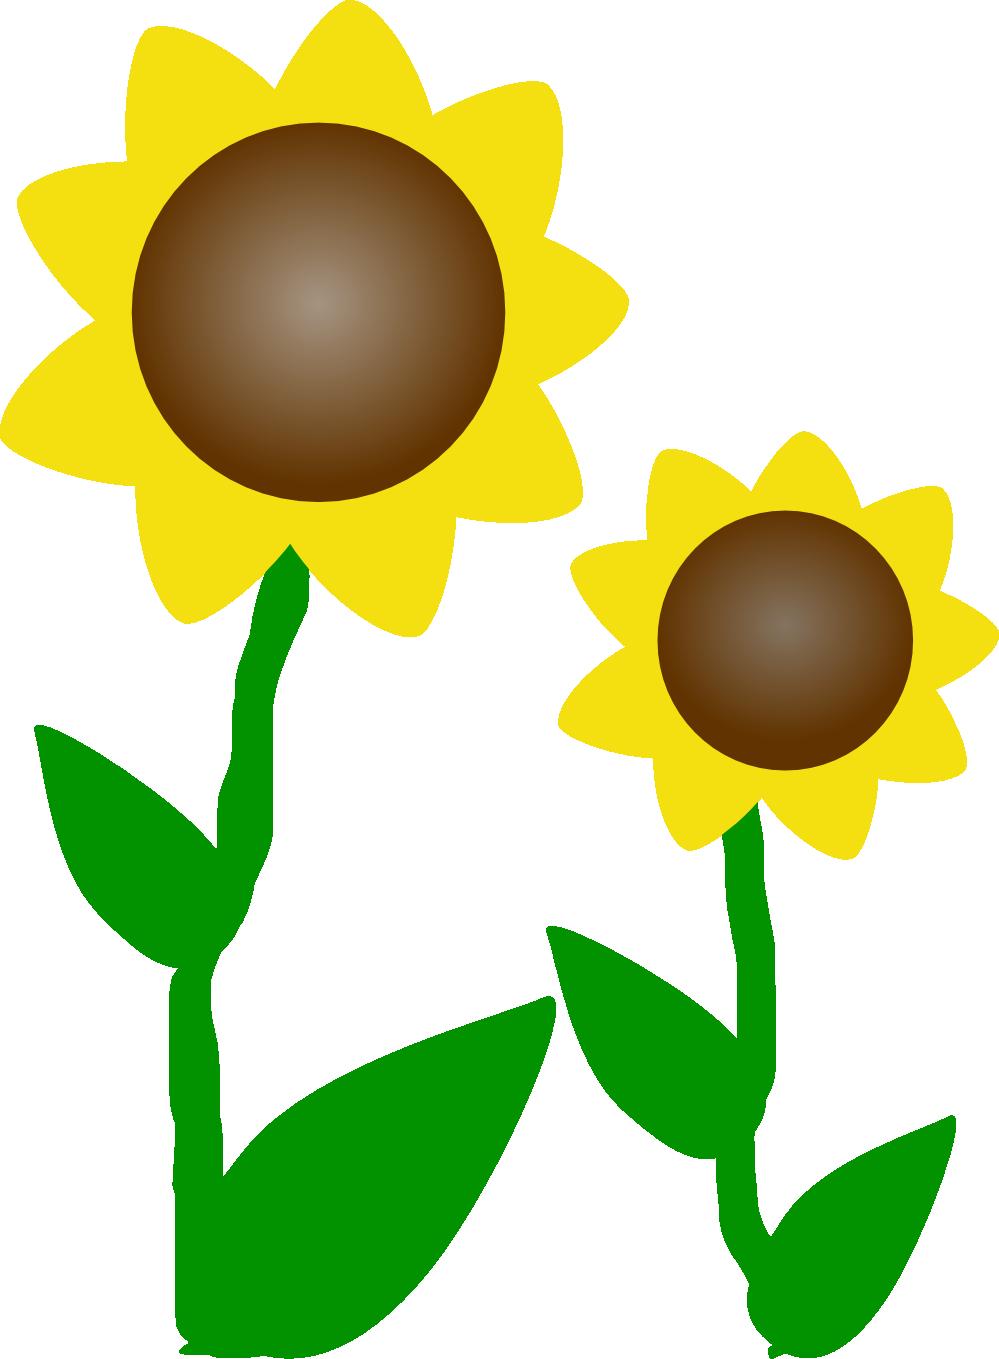 Sunflower sun clipart image transparent Sunflower Clipart | Clipart Panda - Free Clipart Images image transparent